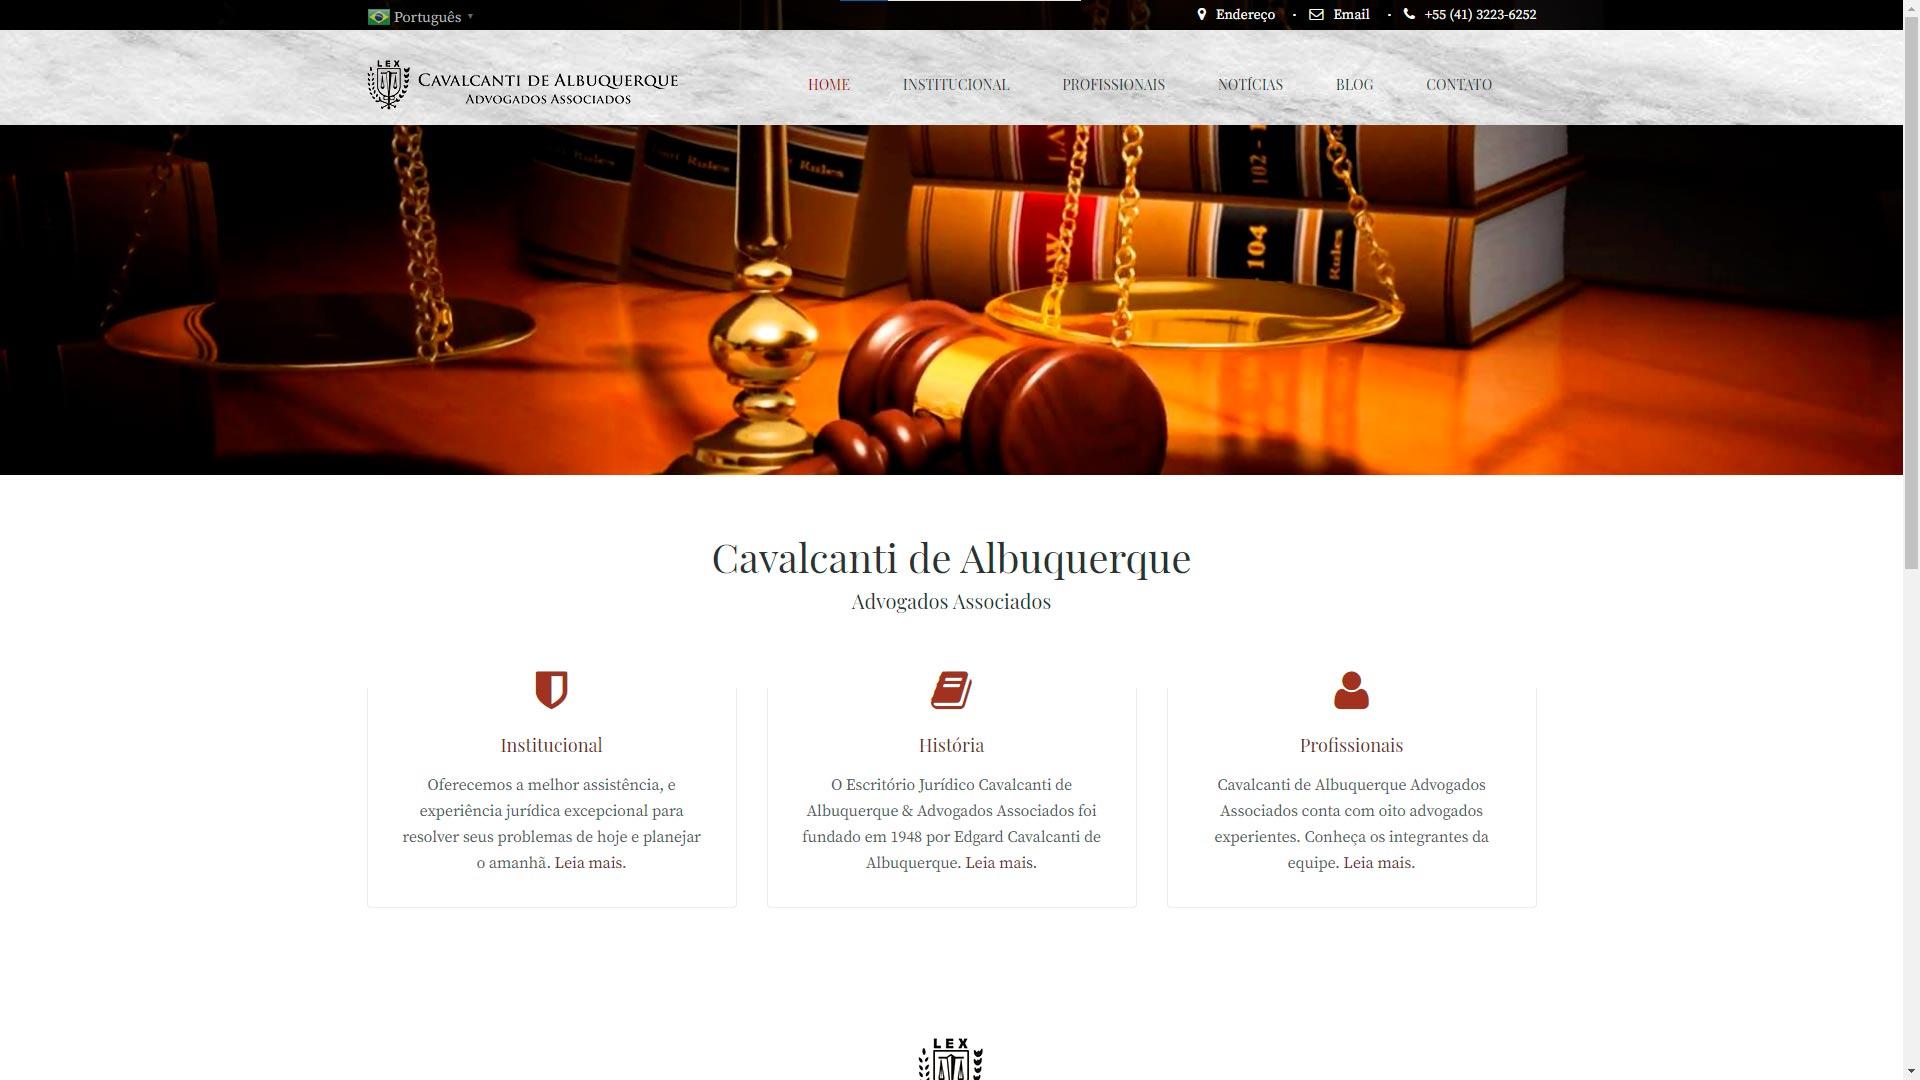 Gtwa Web Design Curitiba Portfólio Cavalcanti De Albuquerque